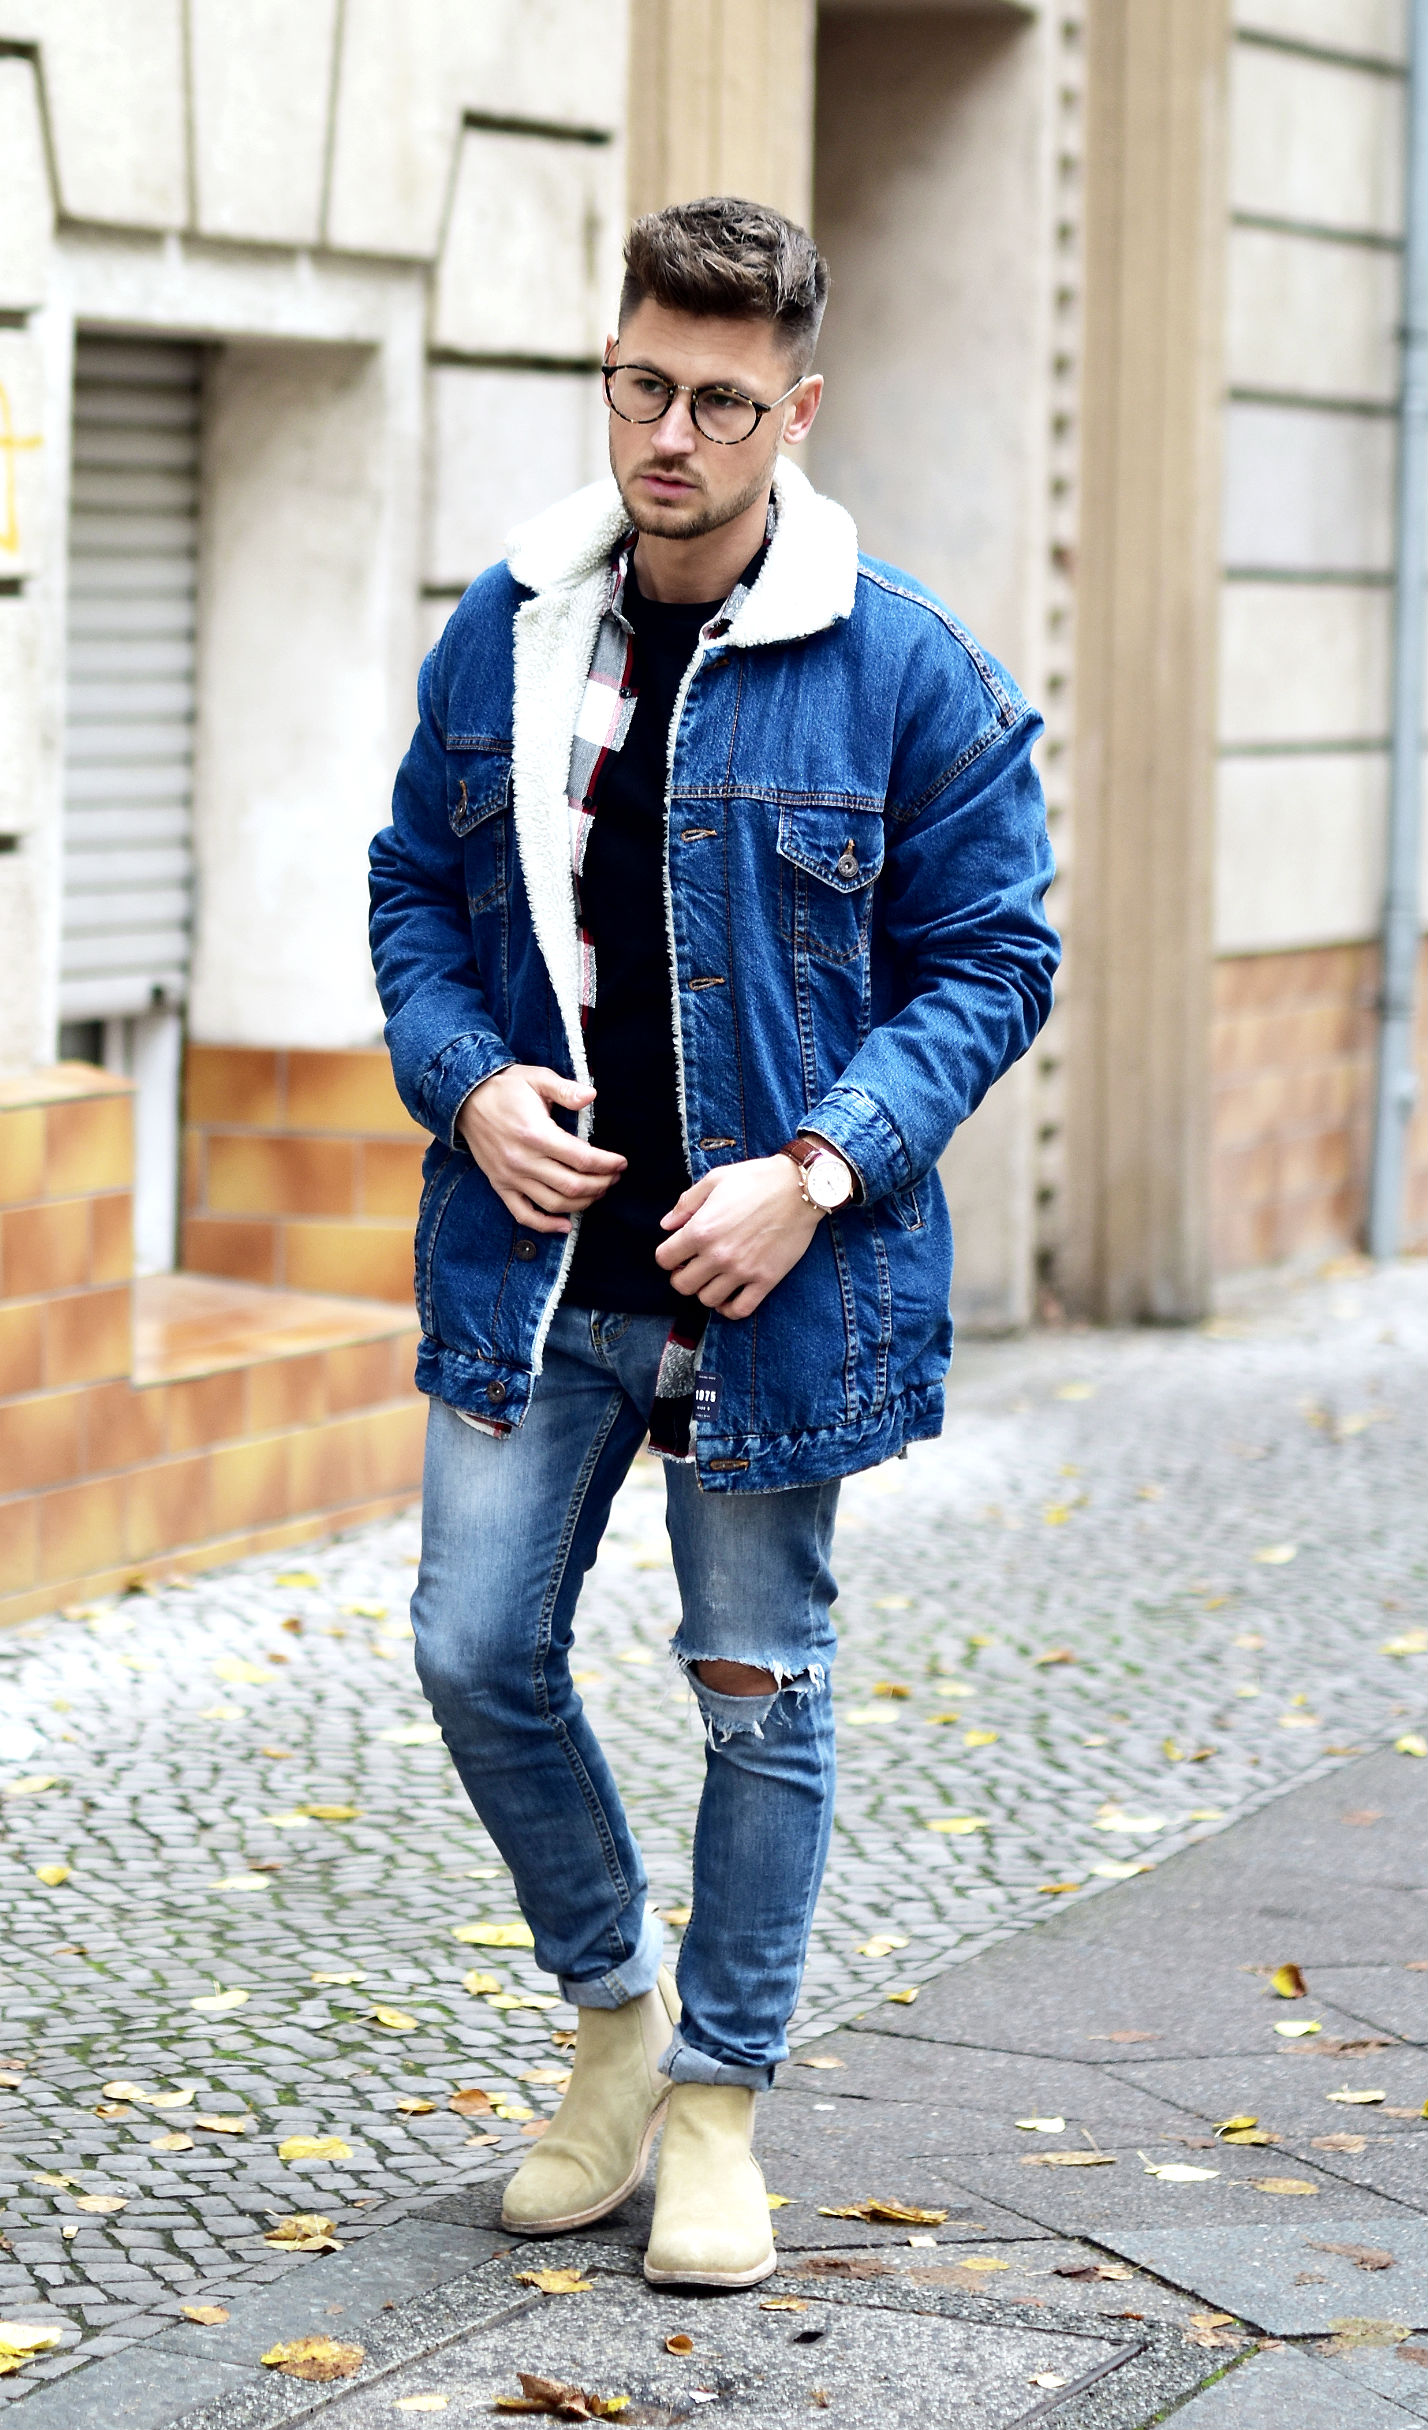 tommeezjerry-styleblog-maennerblog-maenner-modeblog-berlin-berlinblog-maennermodeblog-outfit-jeansjacke-fell-felljeansjacke-chelseaboots-carohemd-streetstyle-6